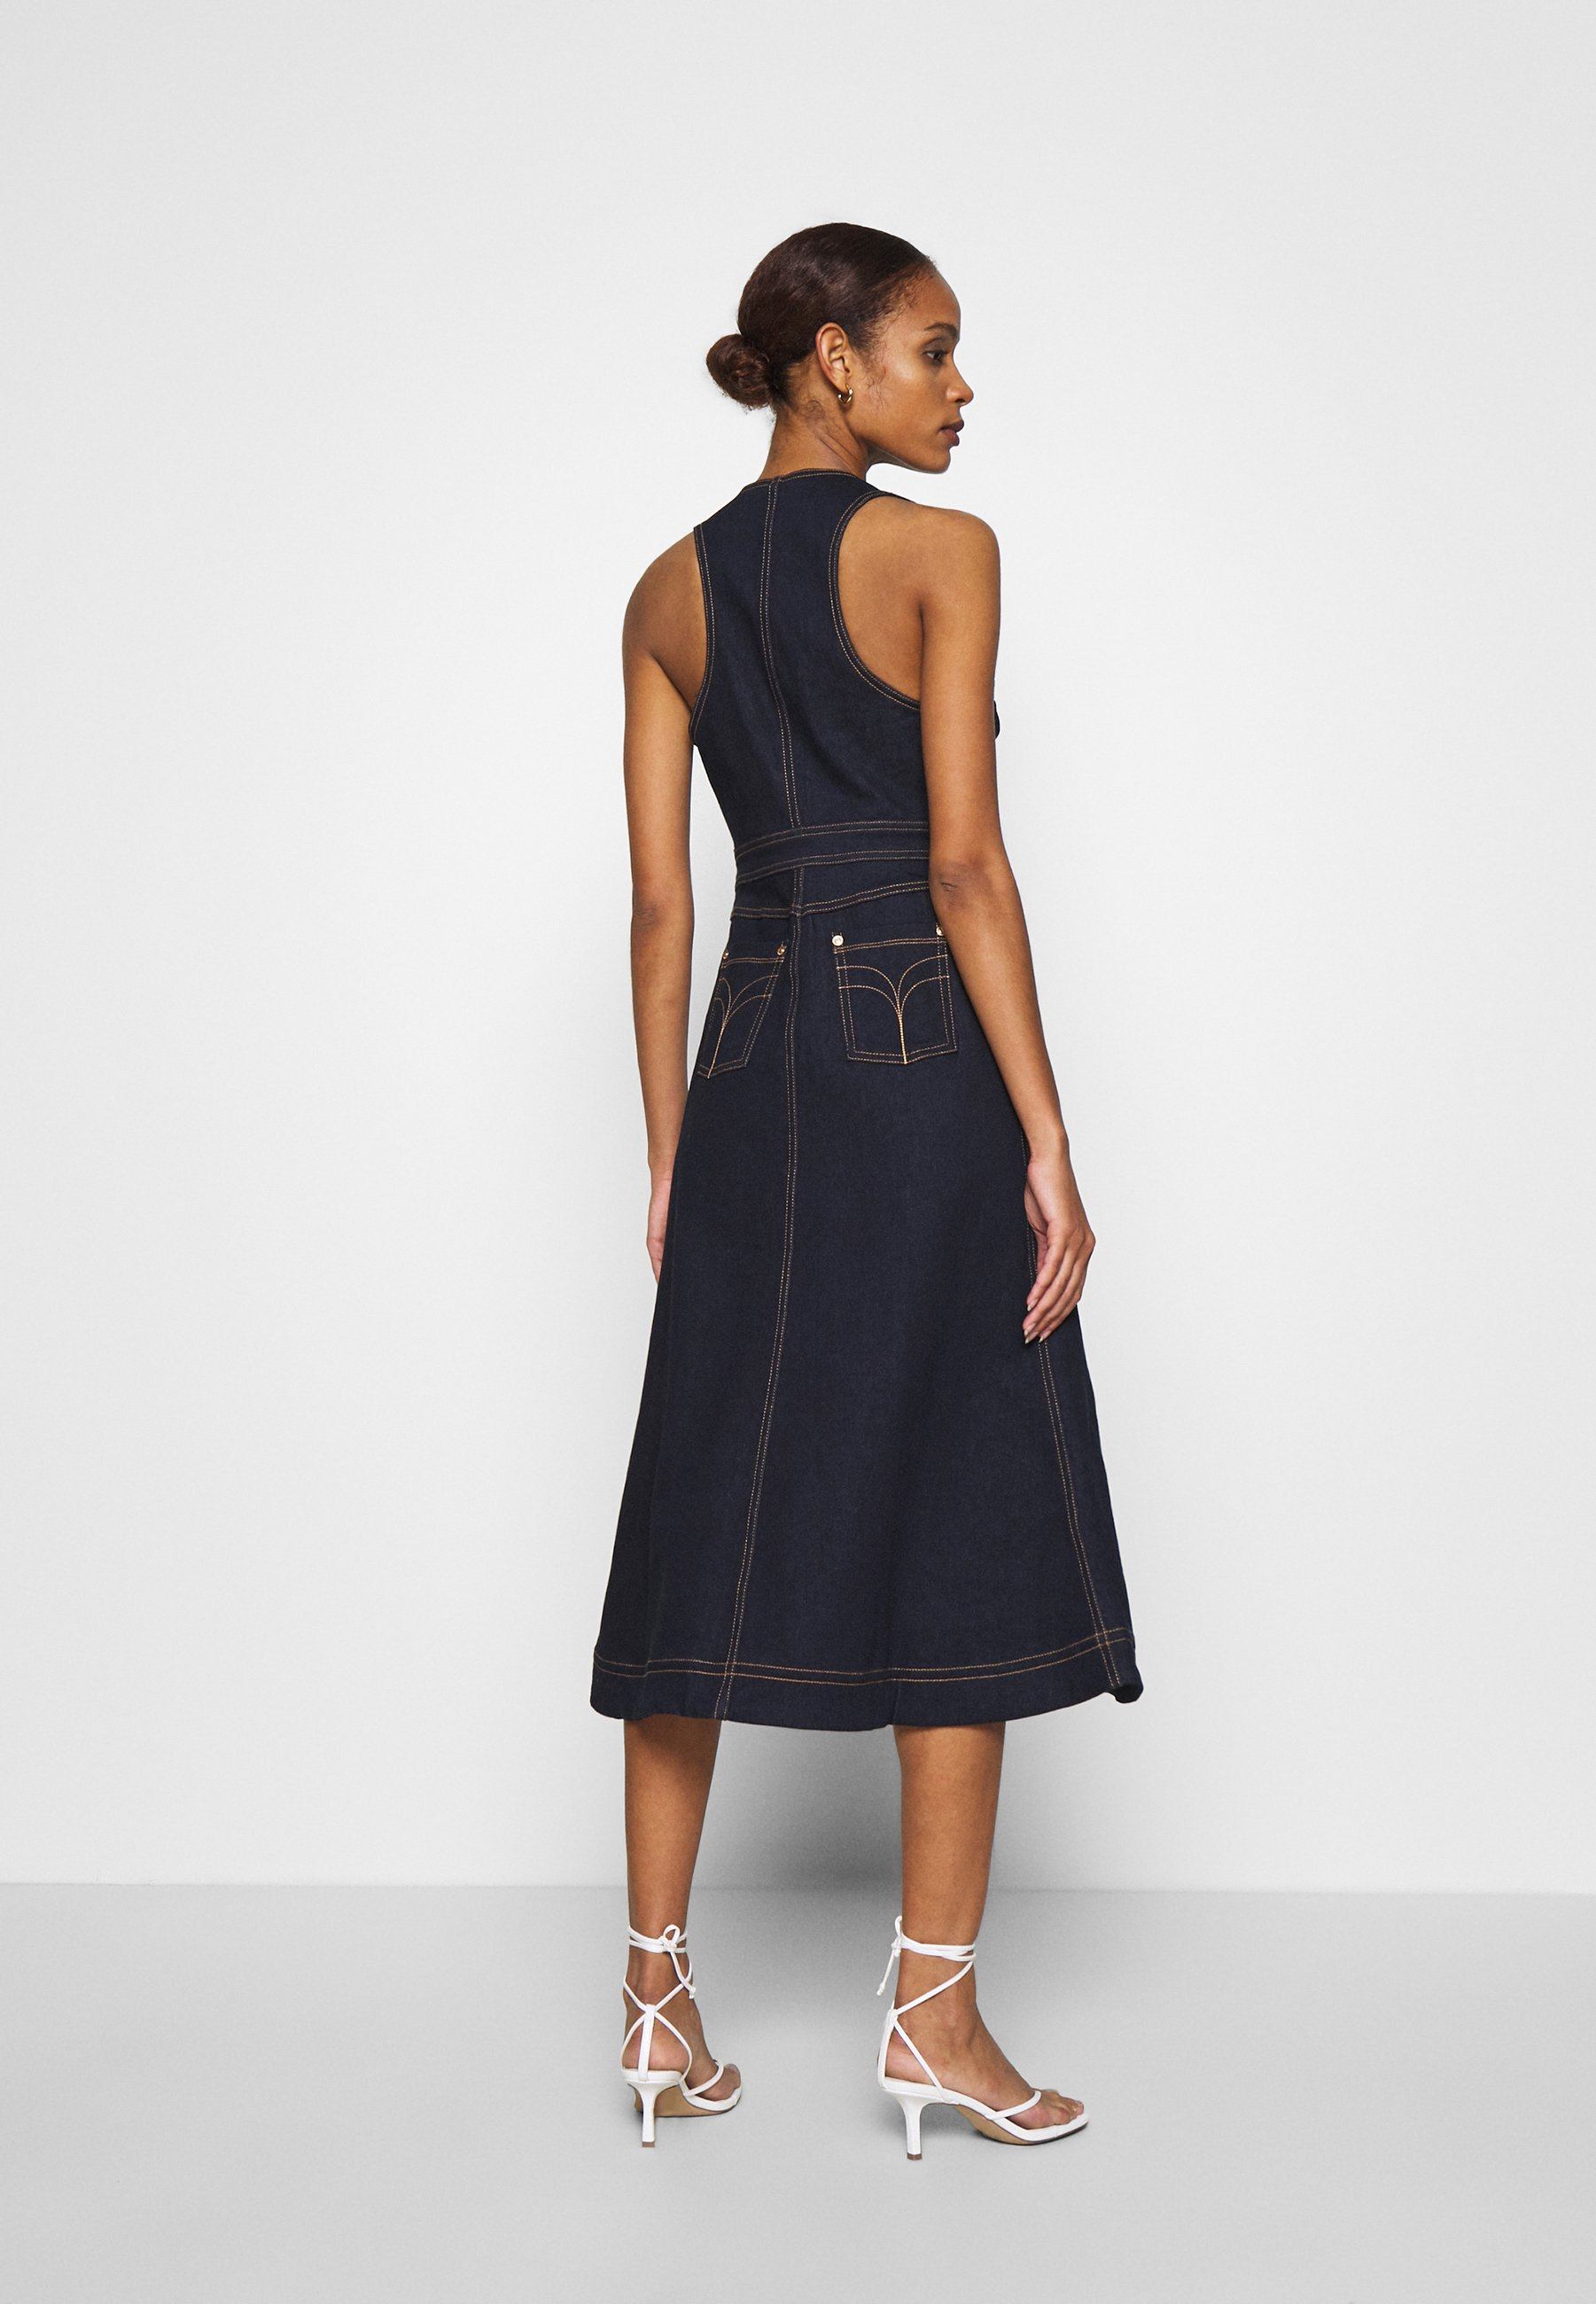 Alice McCall CLUB NOIR DRESS Jeanskleid indigo/blau